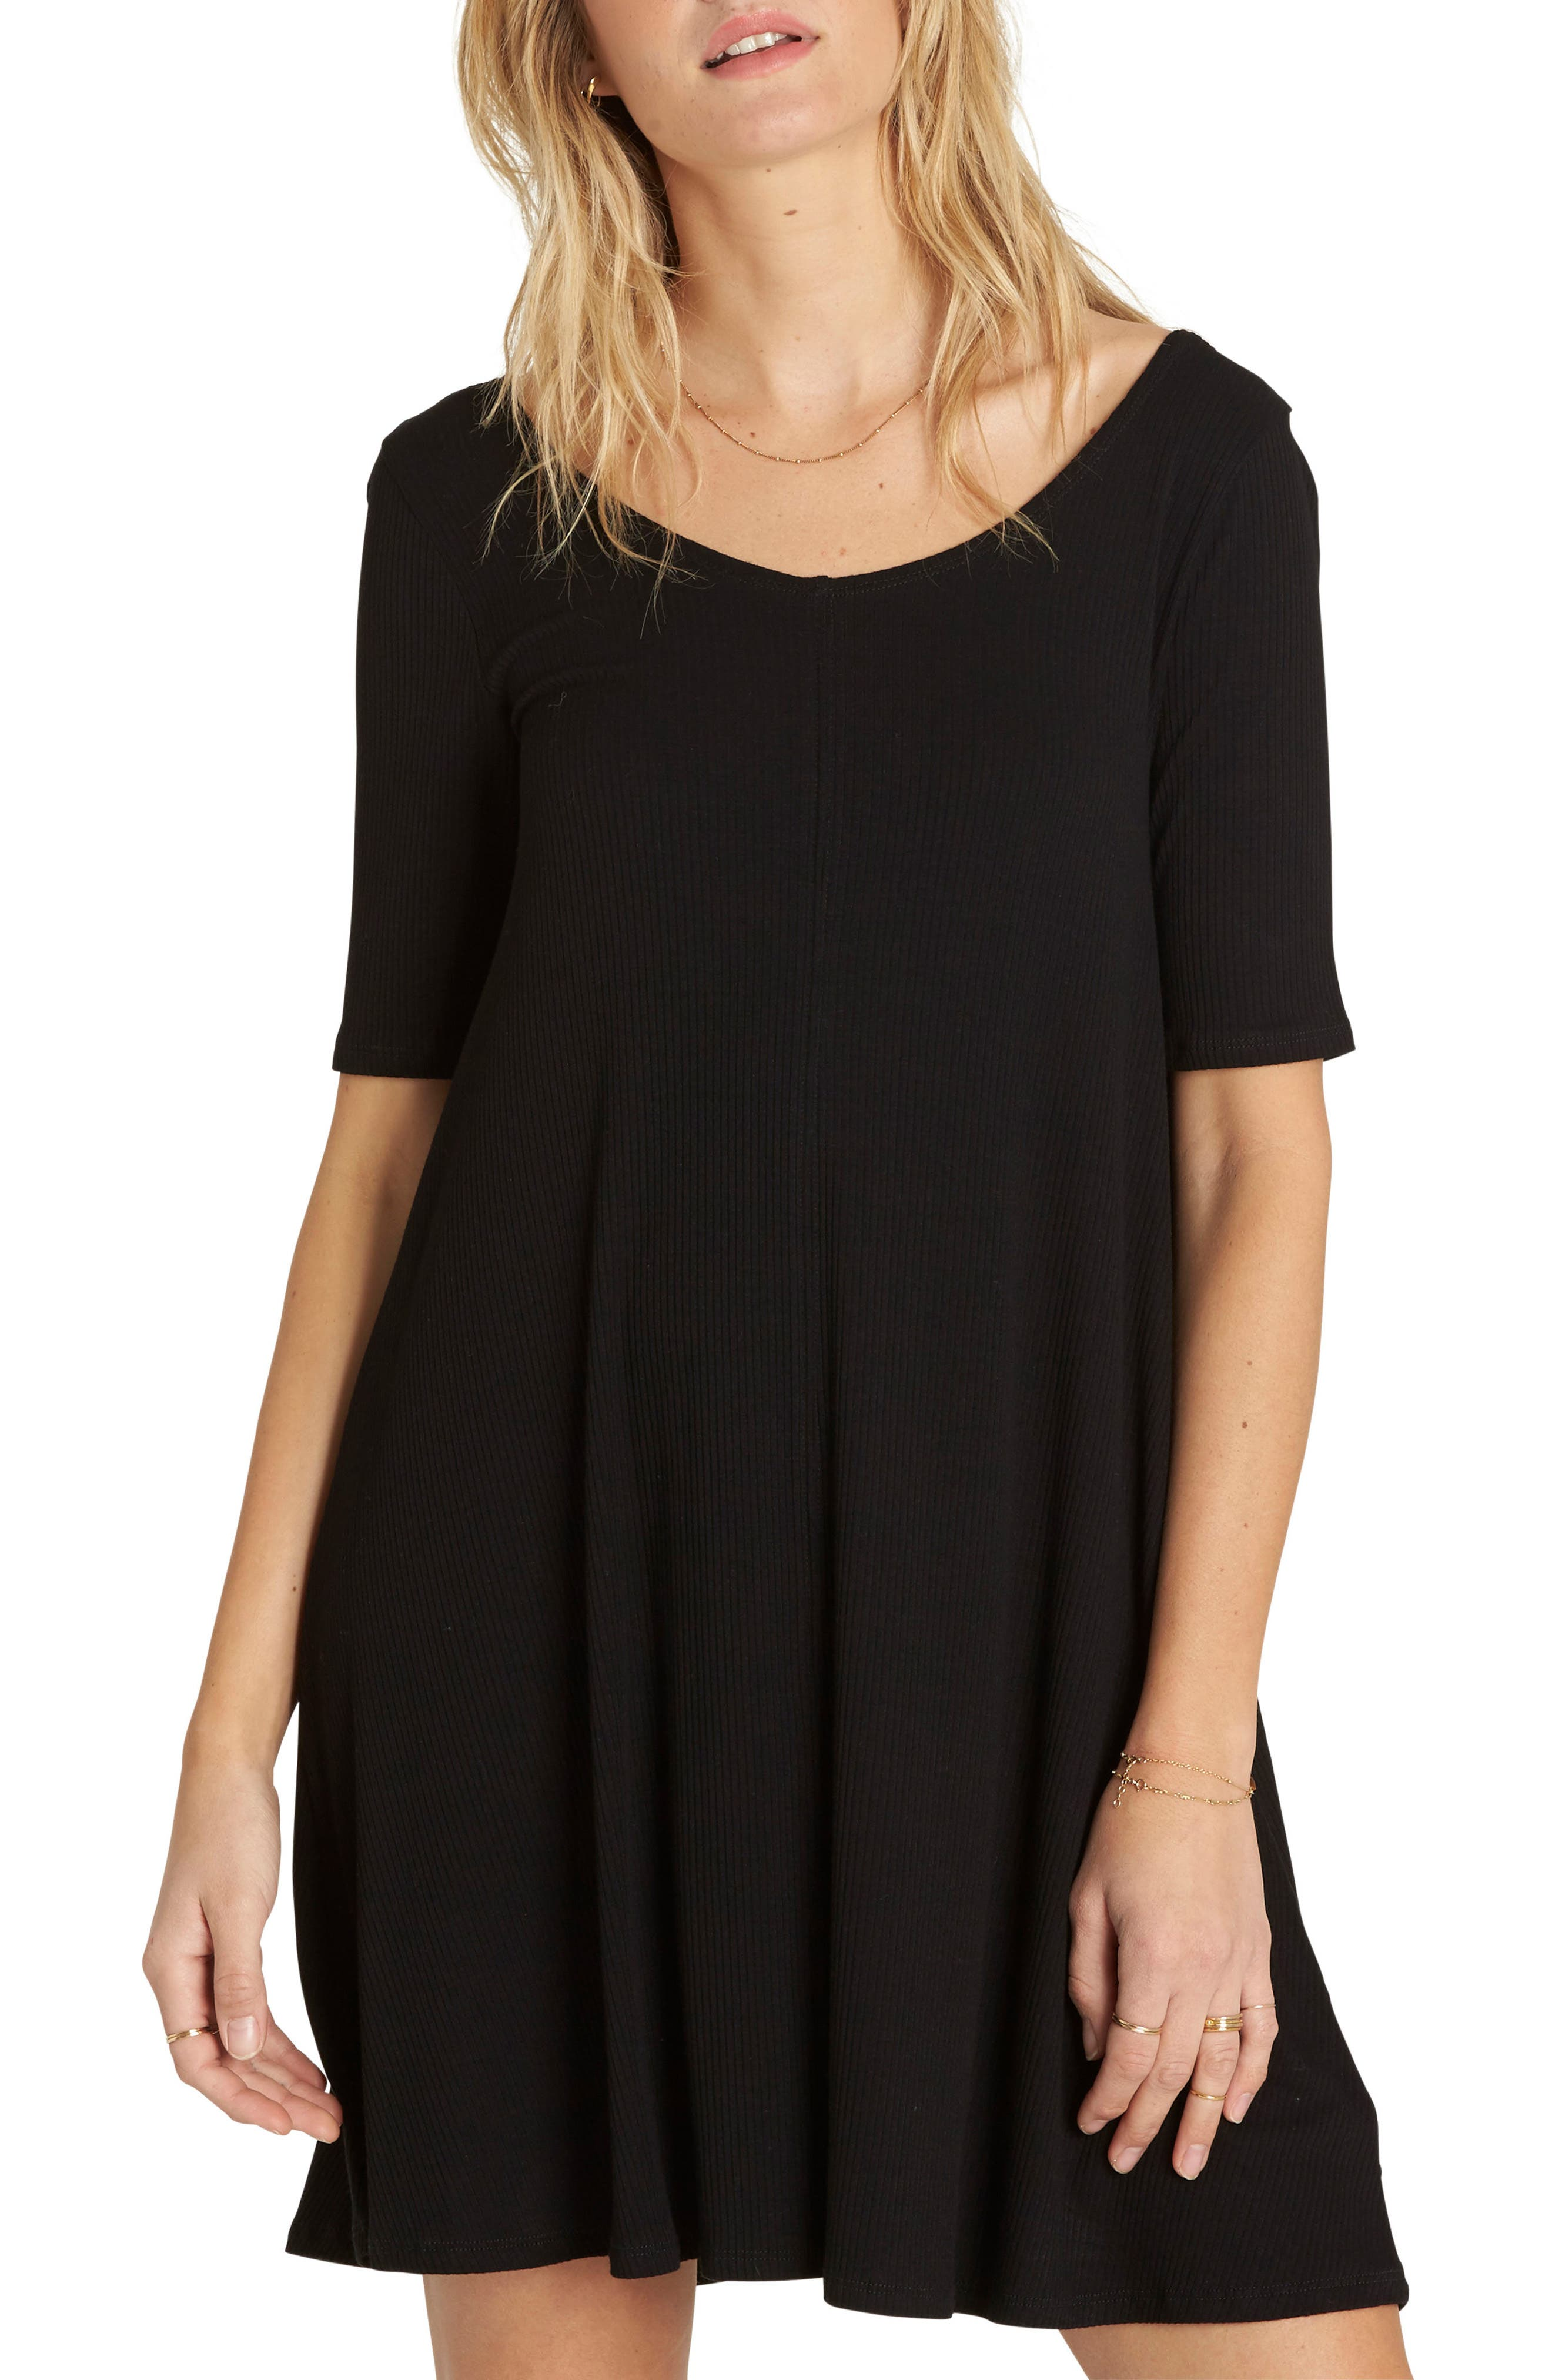 Alternate Image 1 Selected - Billabong Nothing to Hide Ribbed T-Shirt Dress